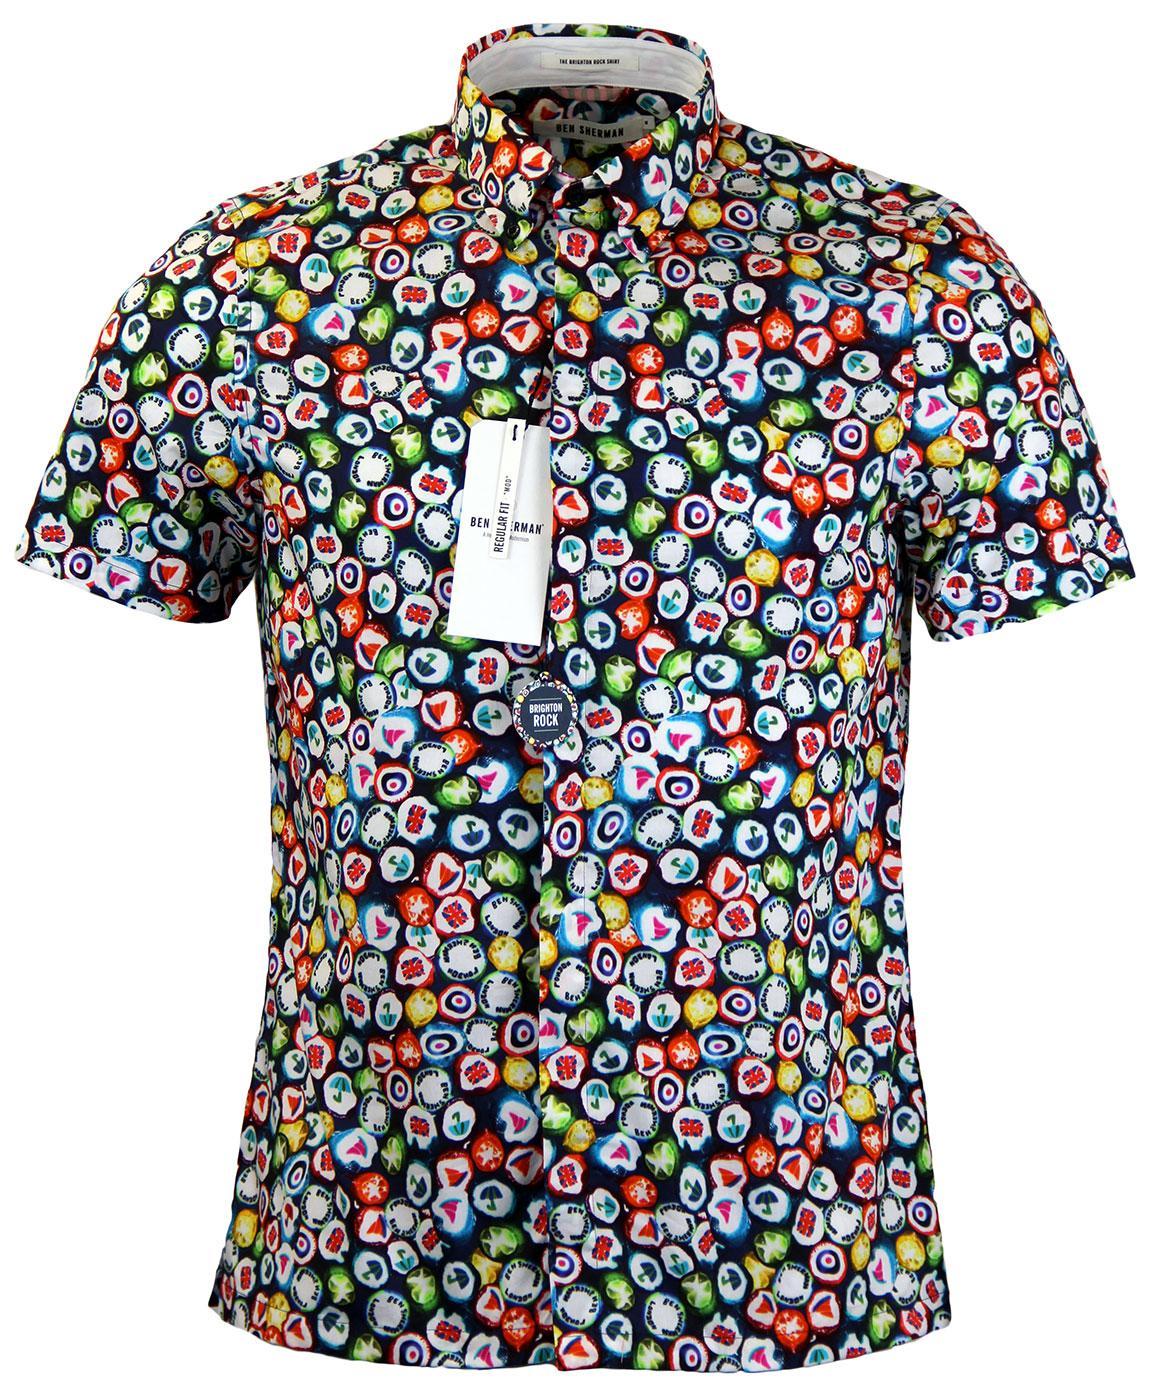 Ben sherman retro 60s mod brighton rock print s s shirt in for Brighton t shirt printing